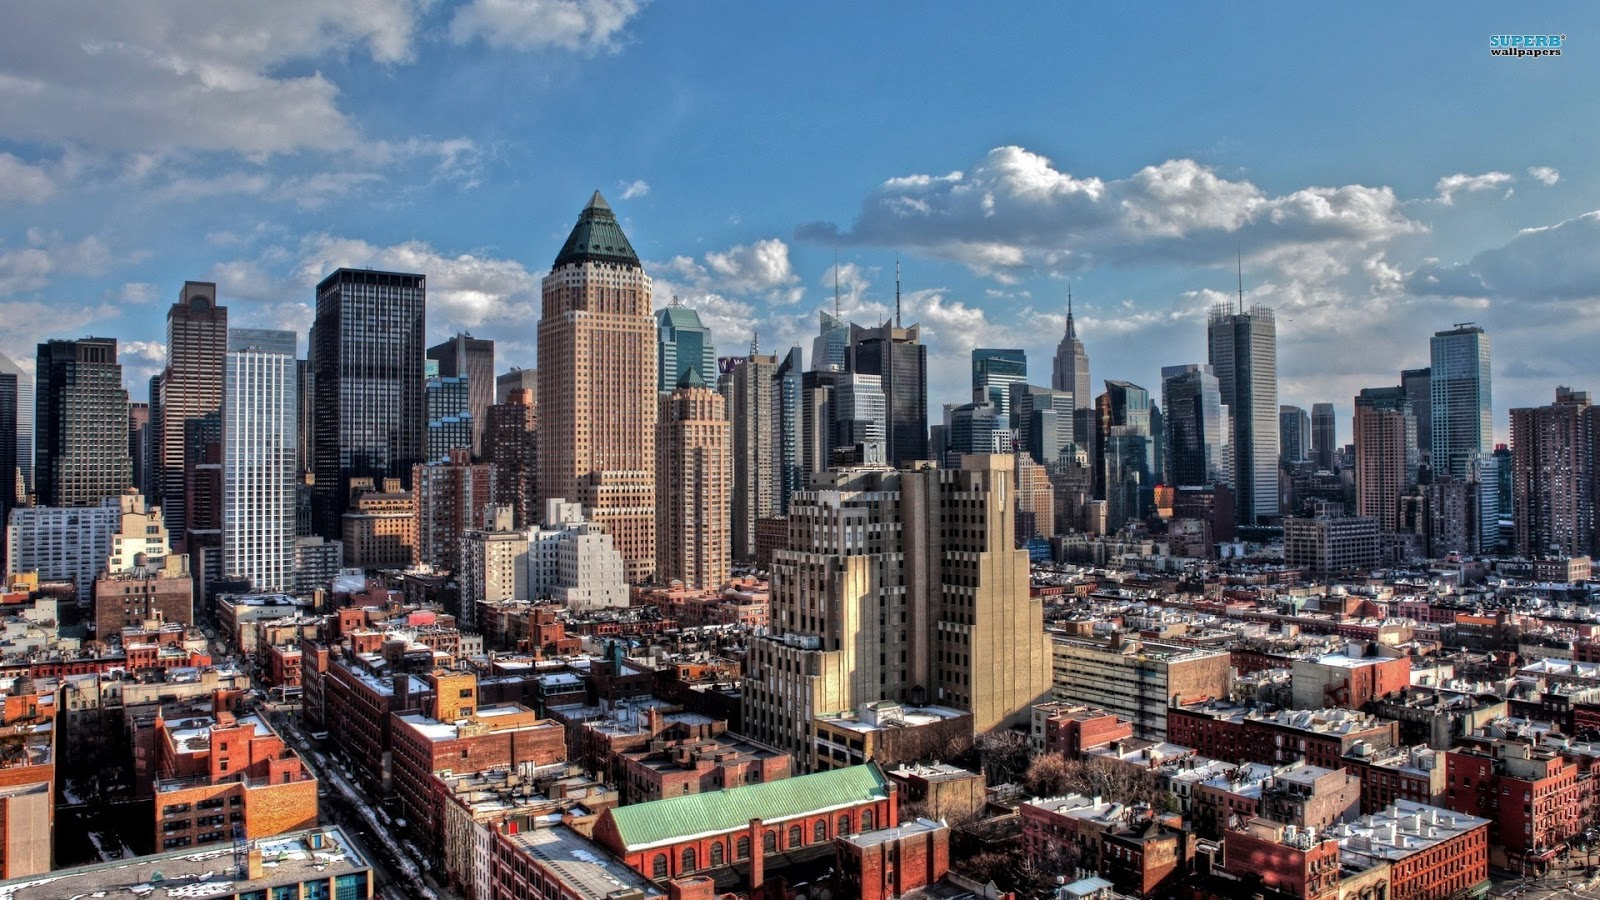 New york city hd wallpapers download 1080p - Wallpaper 1080p new york ...